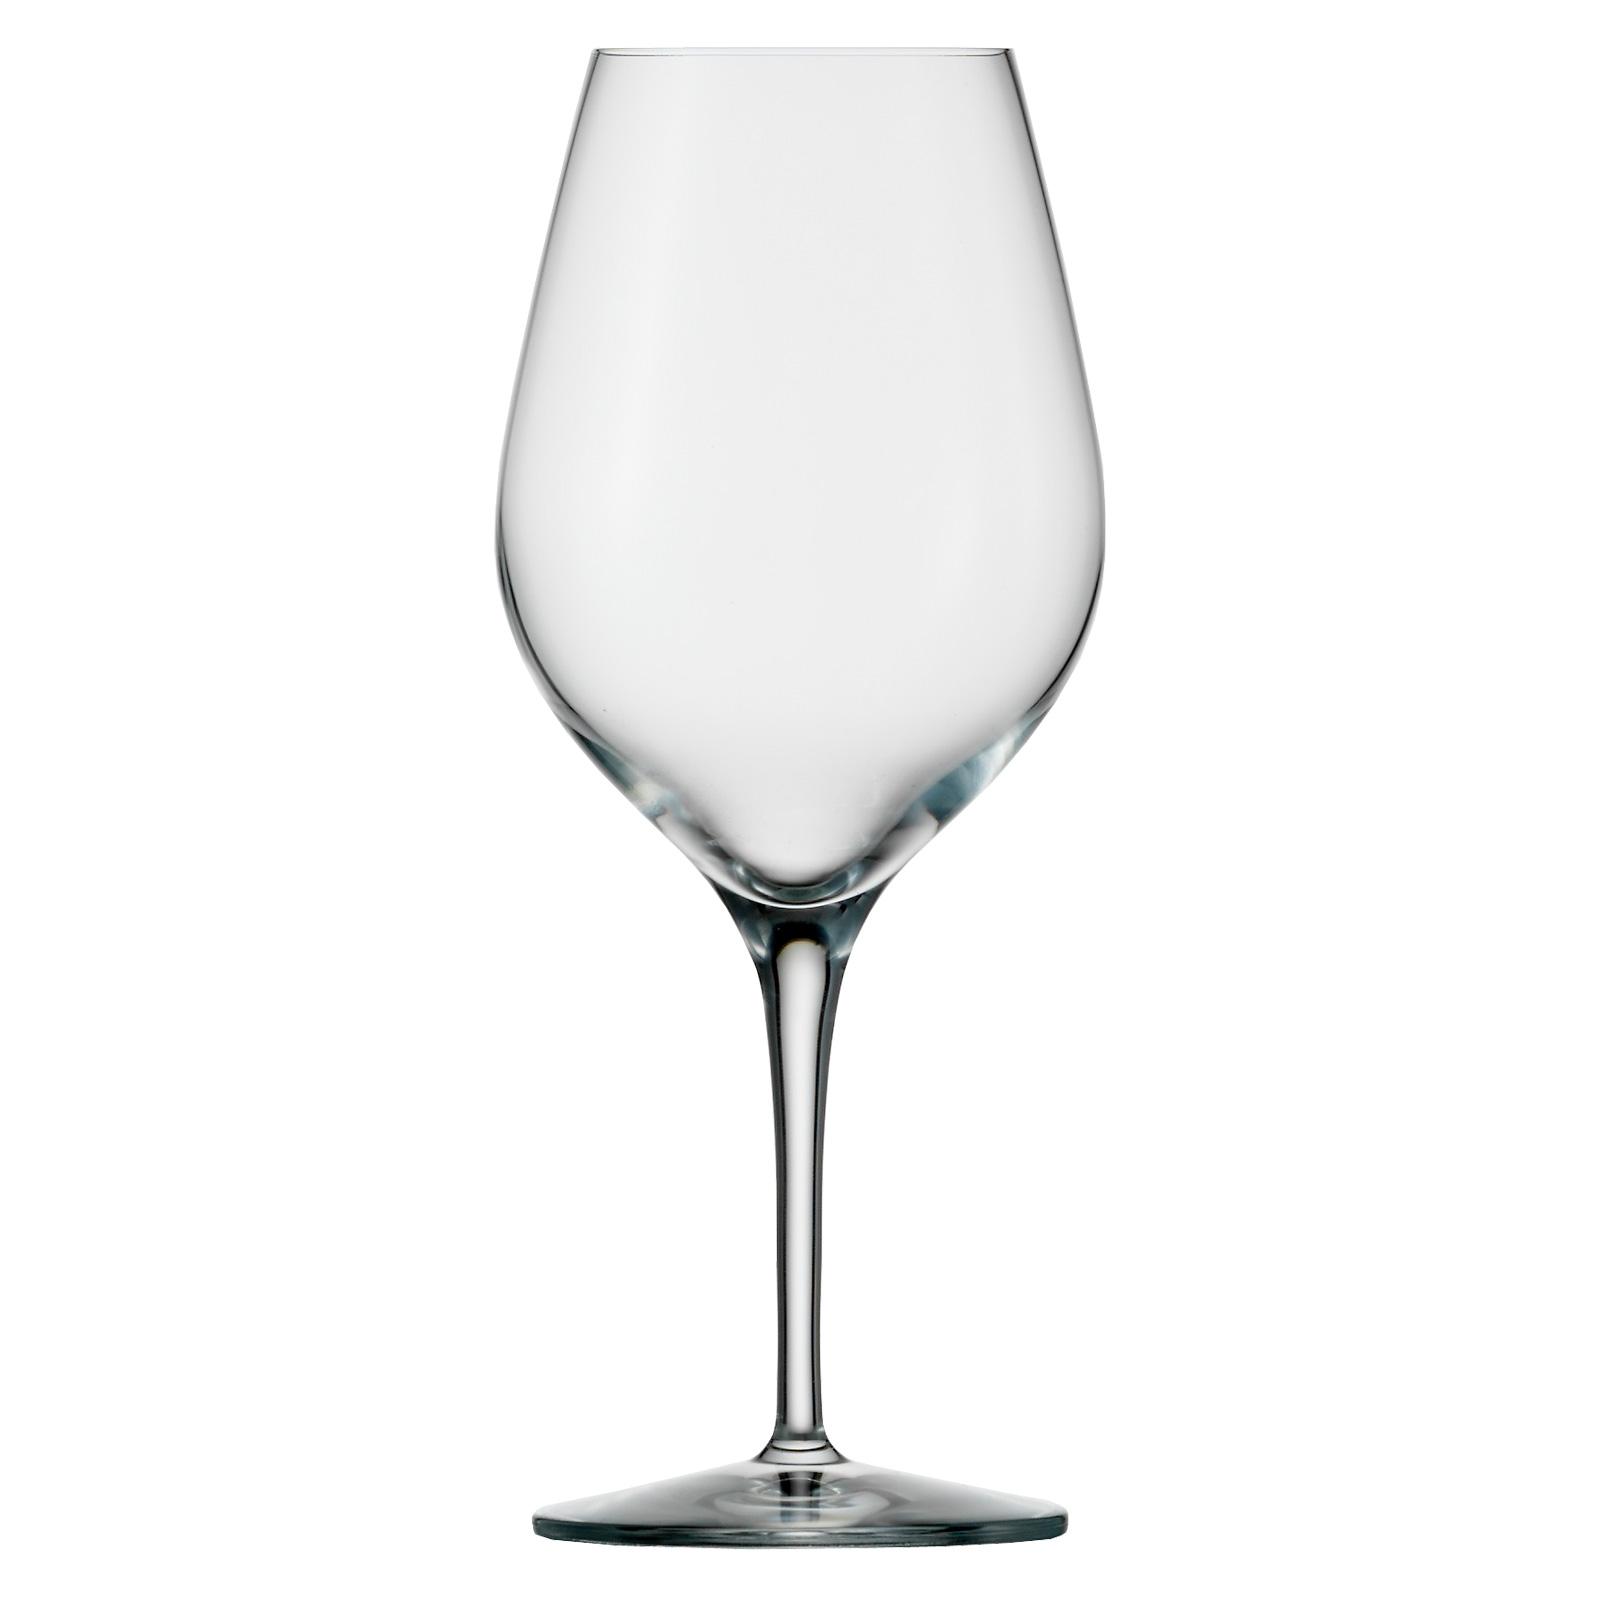 Exquisit White Wine